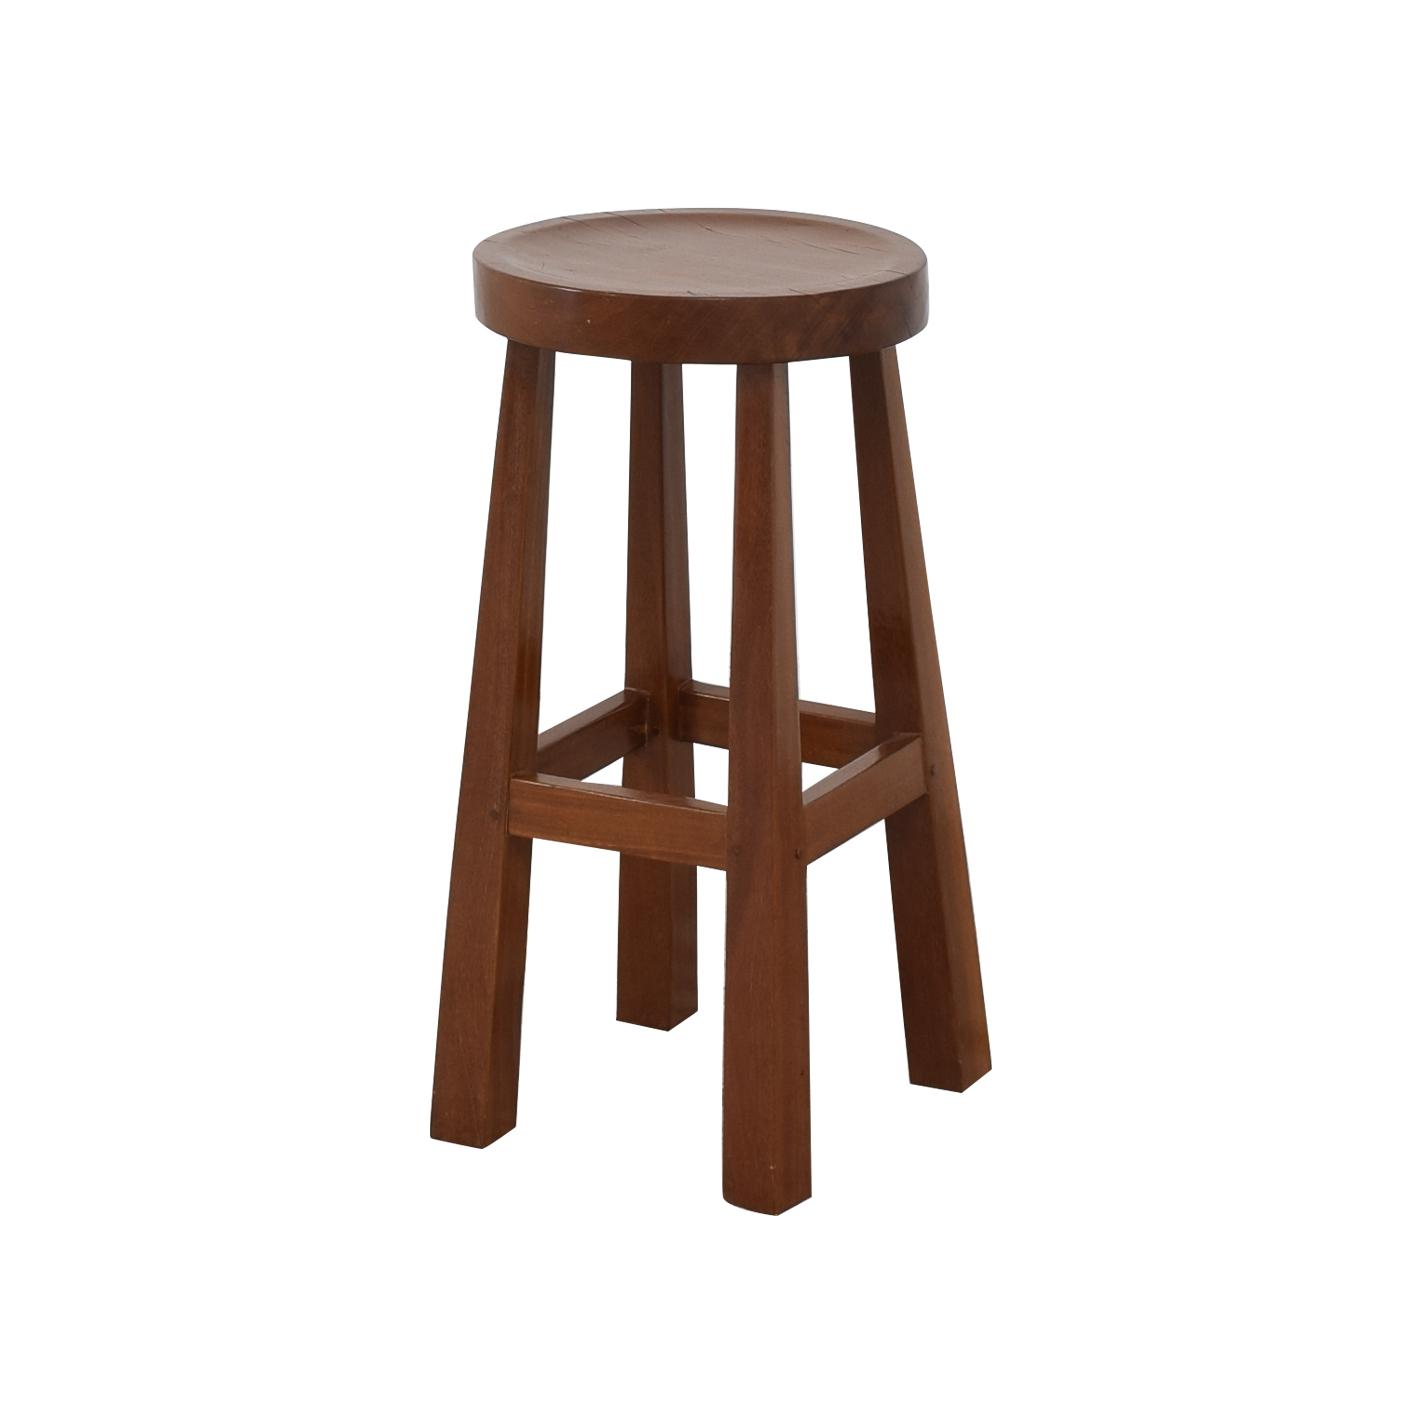 buy Mission Style Wood Bar Stools